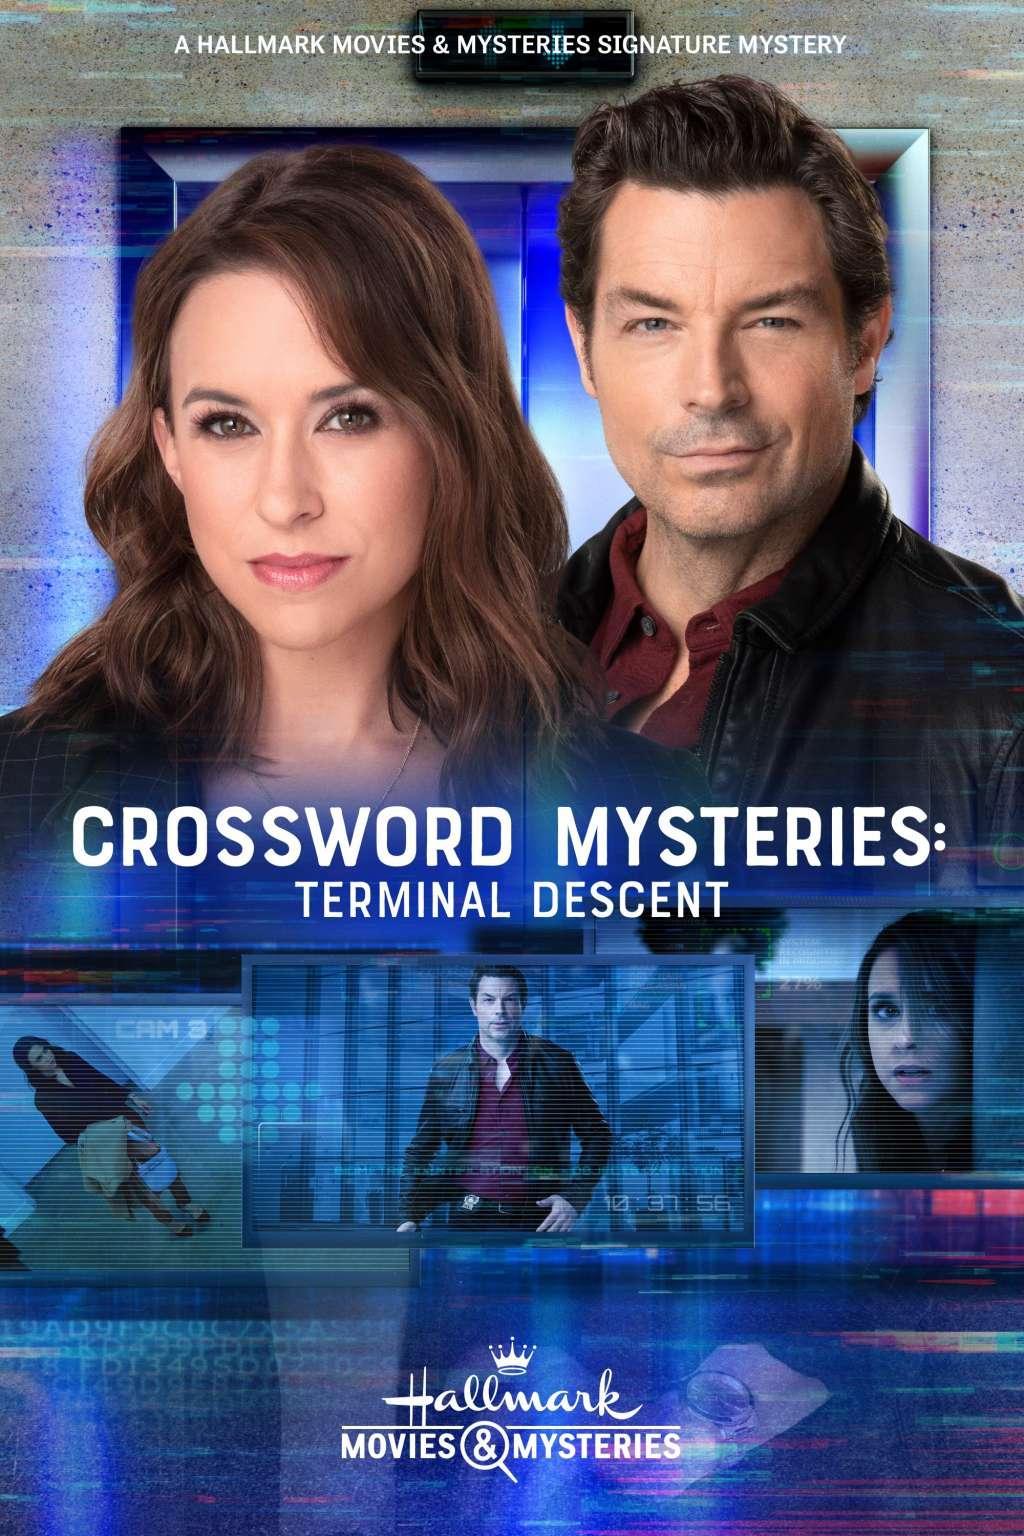 Crossword Mysteries: Terminal Descent kapak